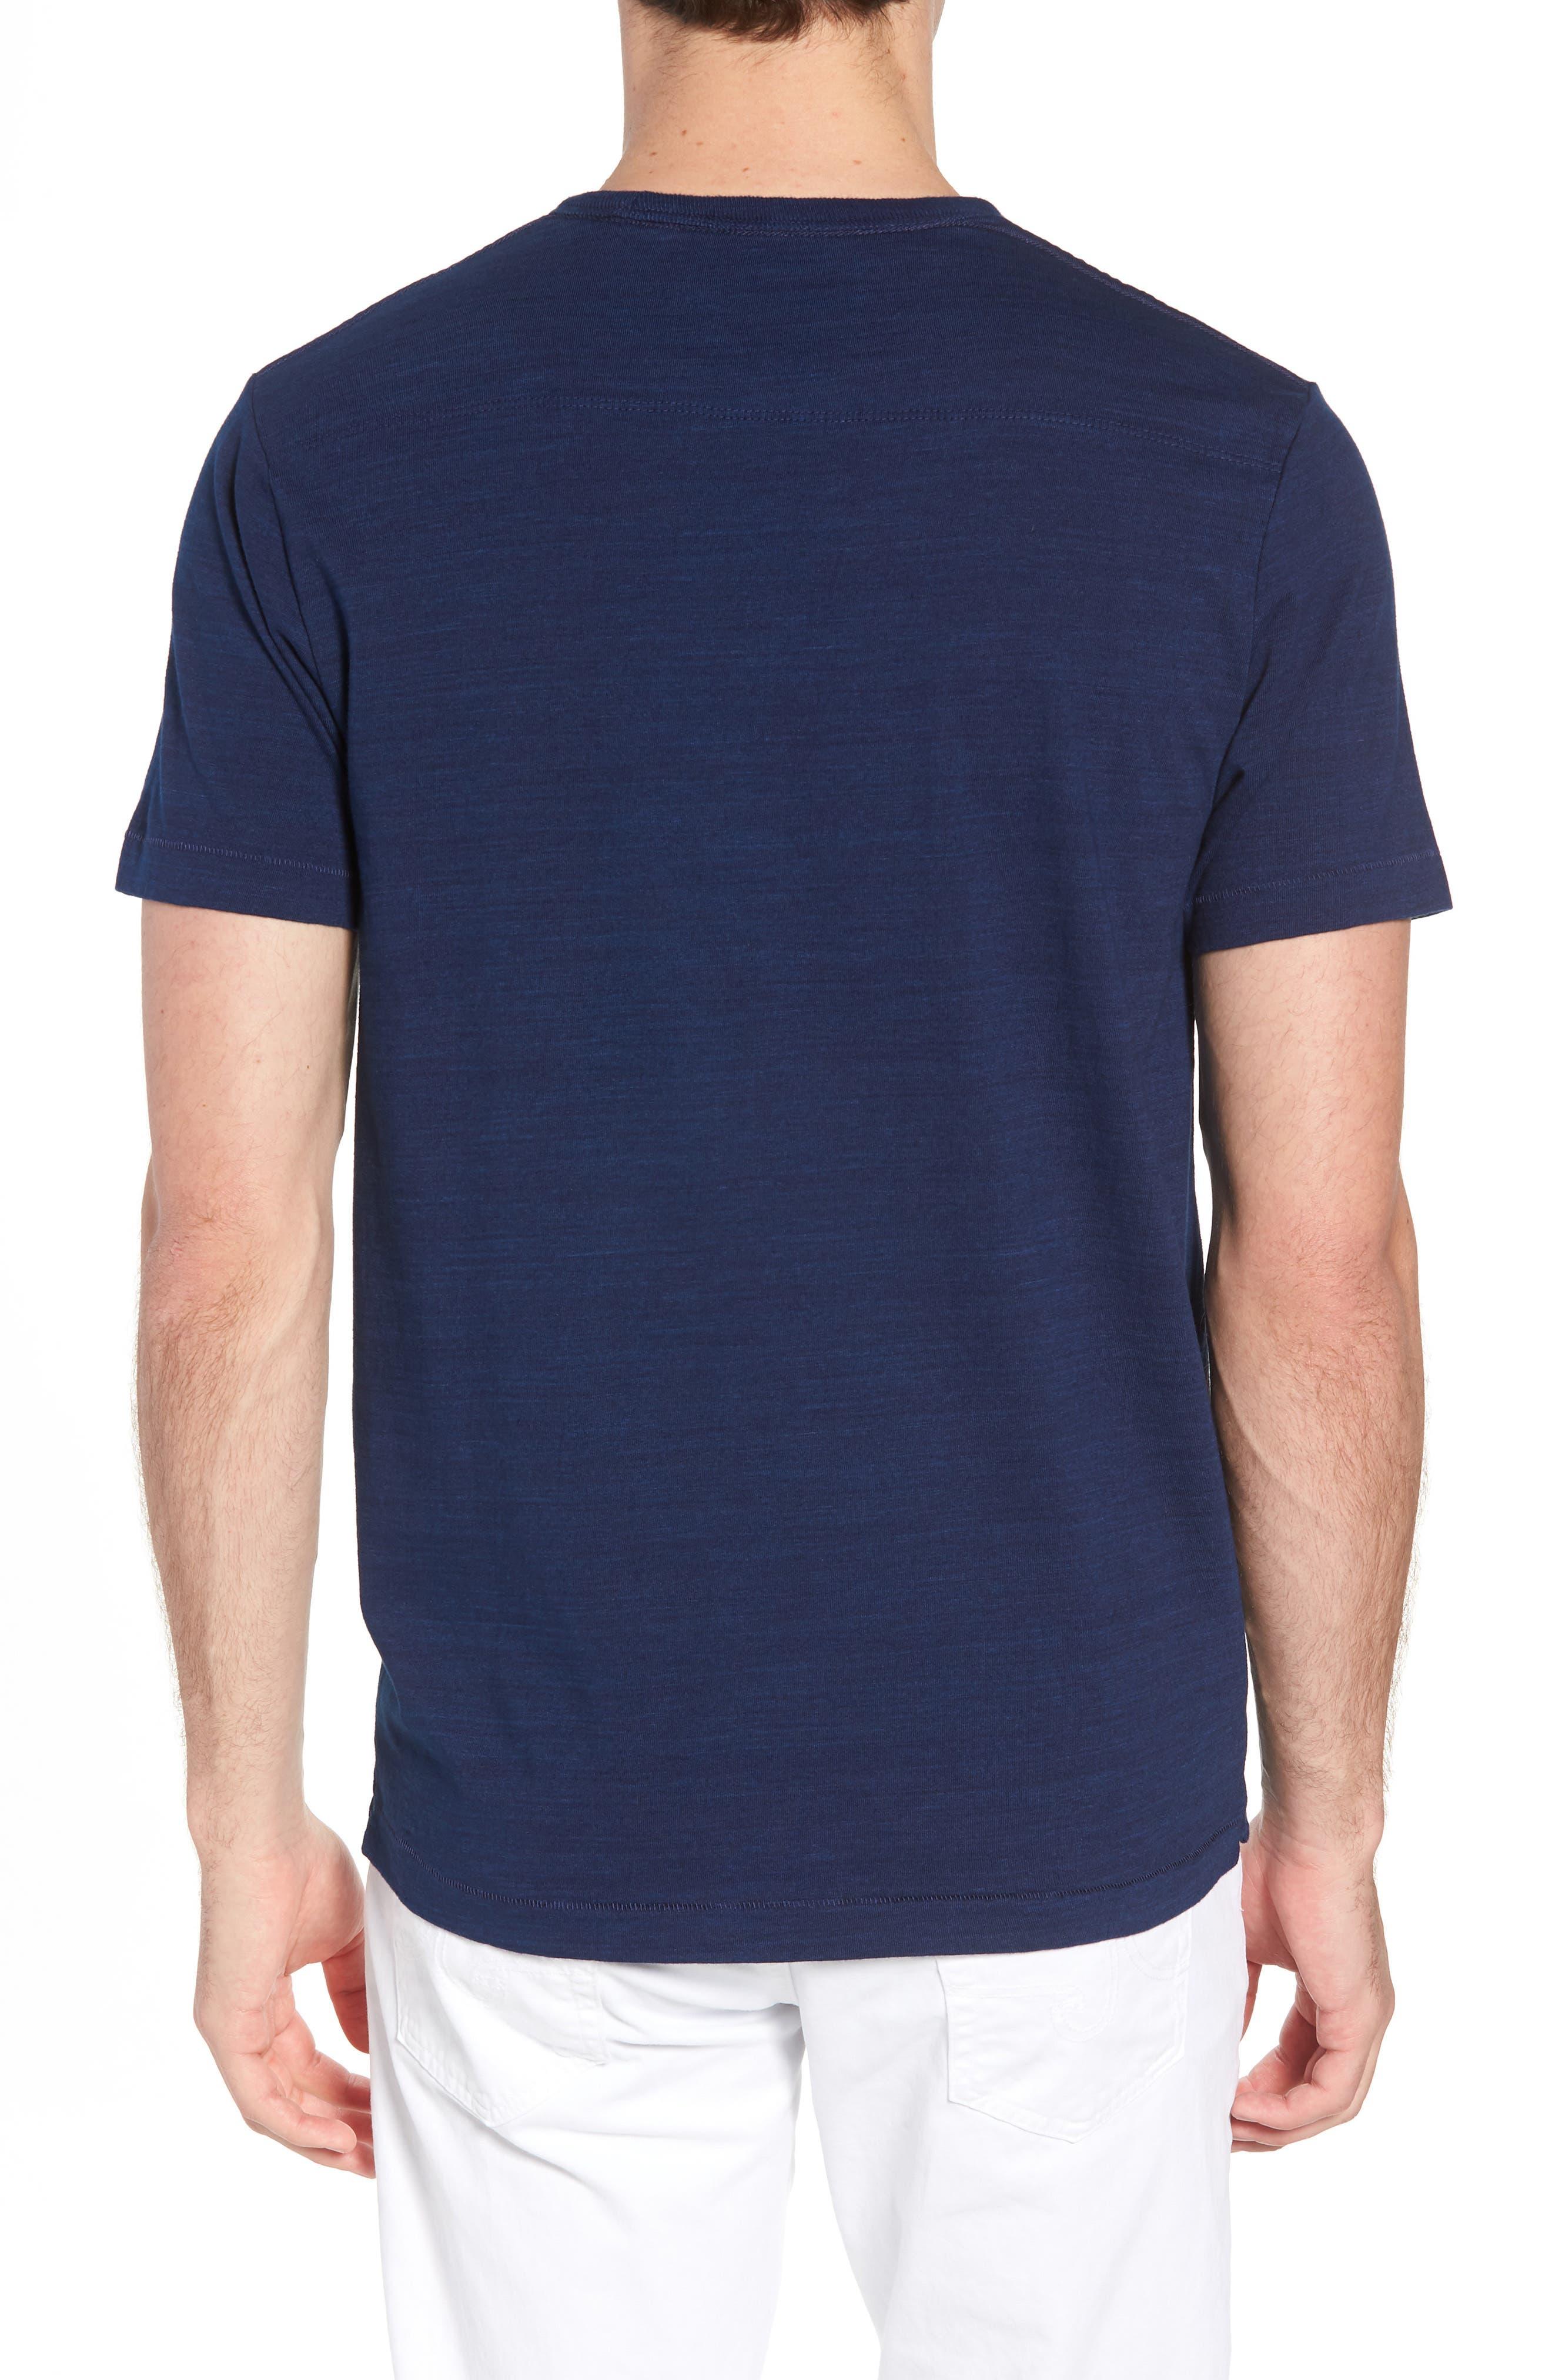 Sacré Bleu Graphic T-Shirt,                             Alternate thumbnail 2, color,                             Rinse